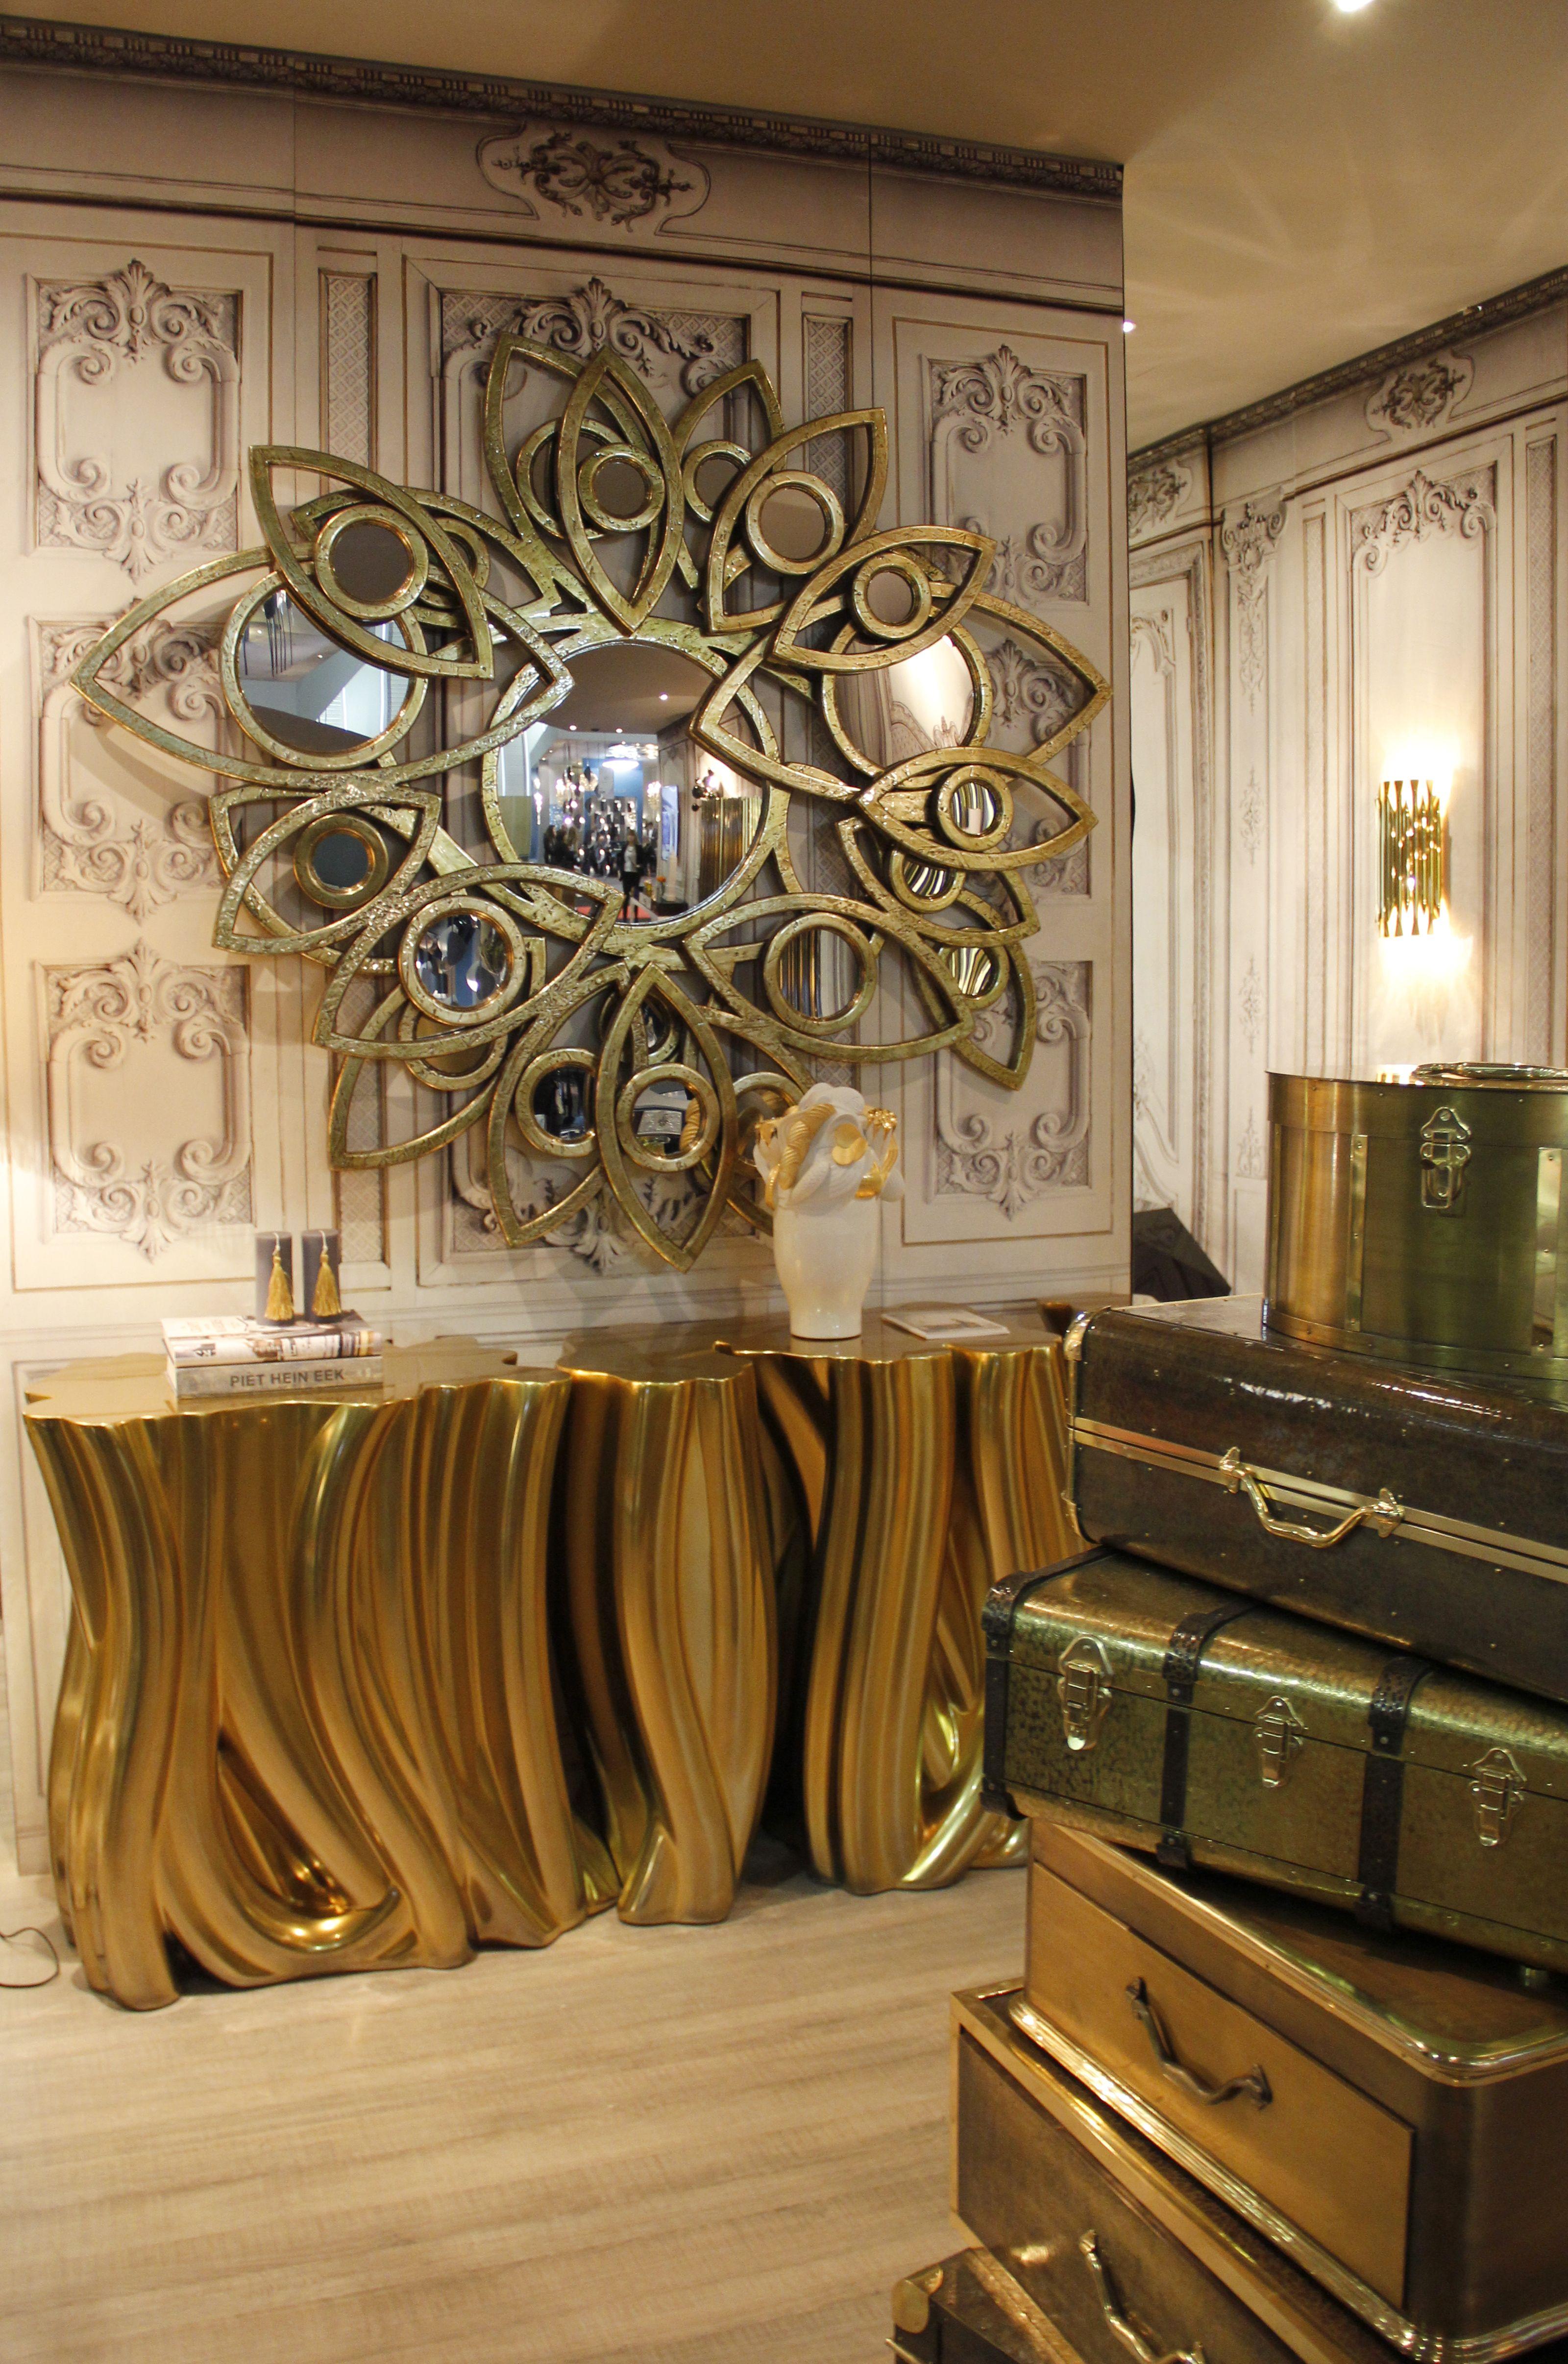 apollo mirror monochrome gold console boheme luxury safe from boca do lobo maison objet fairs. Black Bedroom Furniture Sets. Home Design Ideas